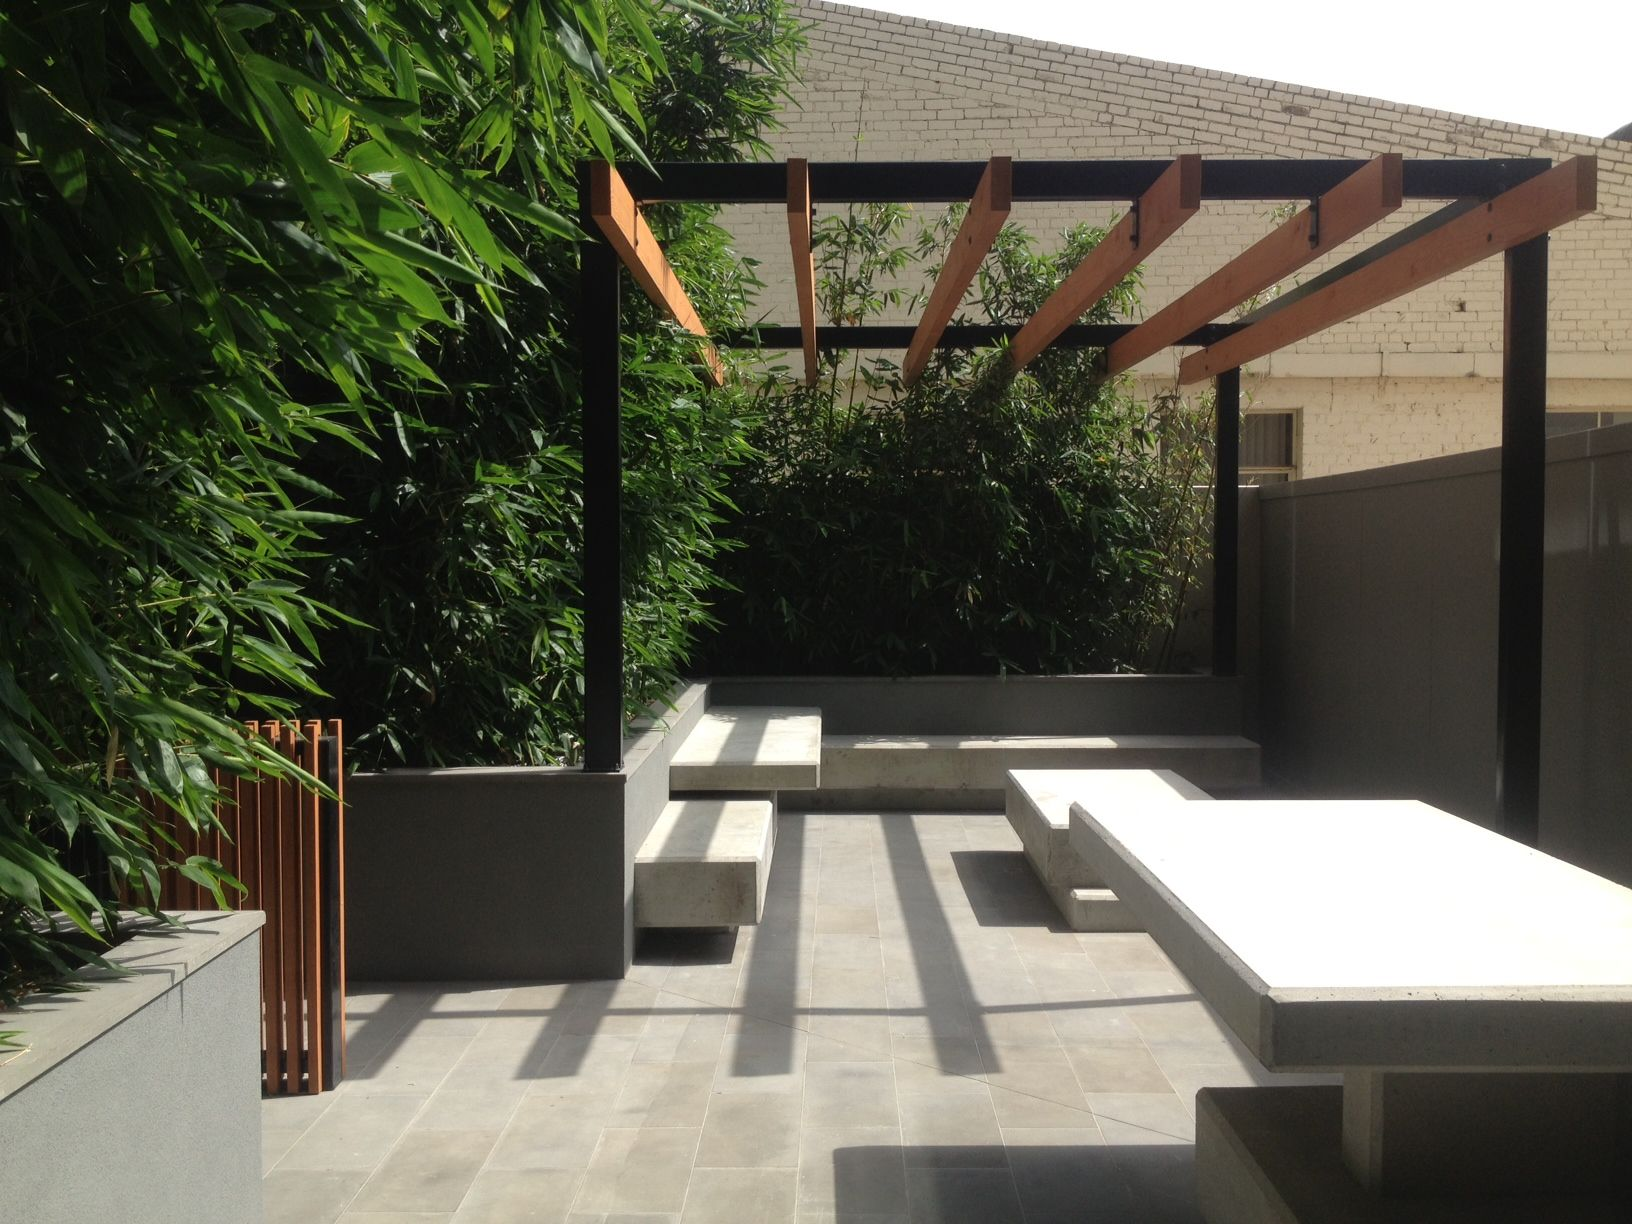 The Bamboo Courtyard Modern Pergolapergola